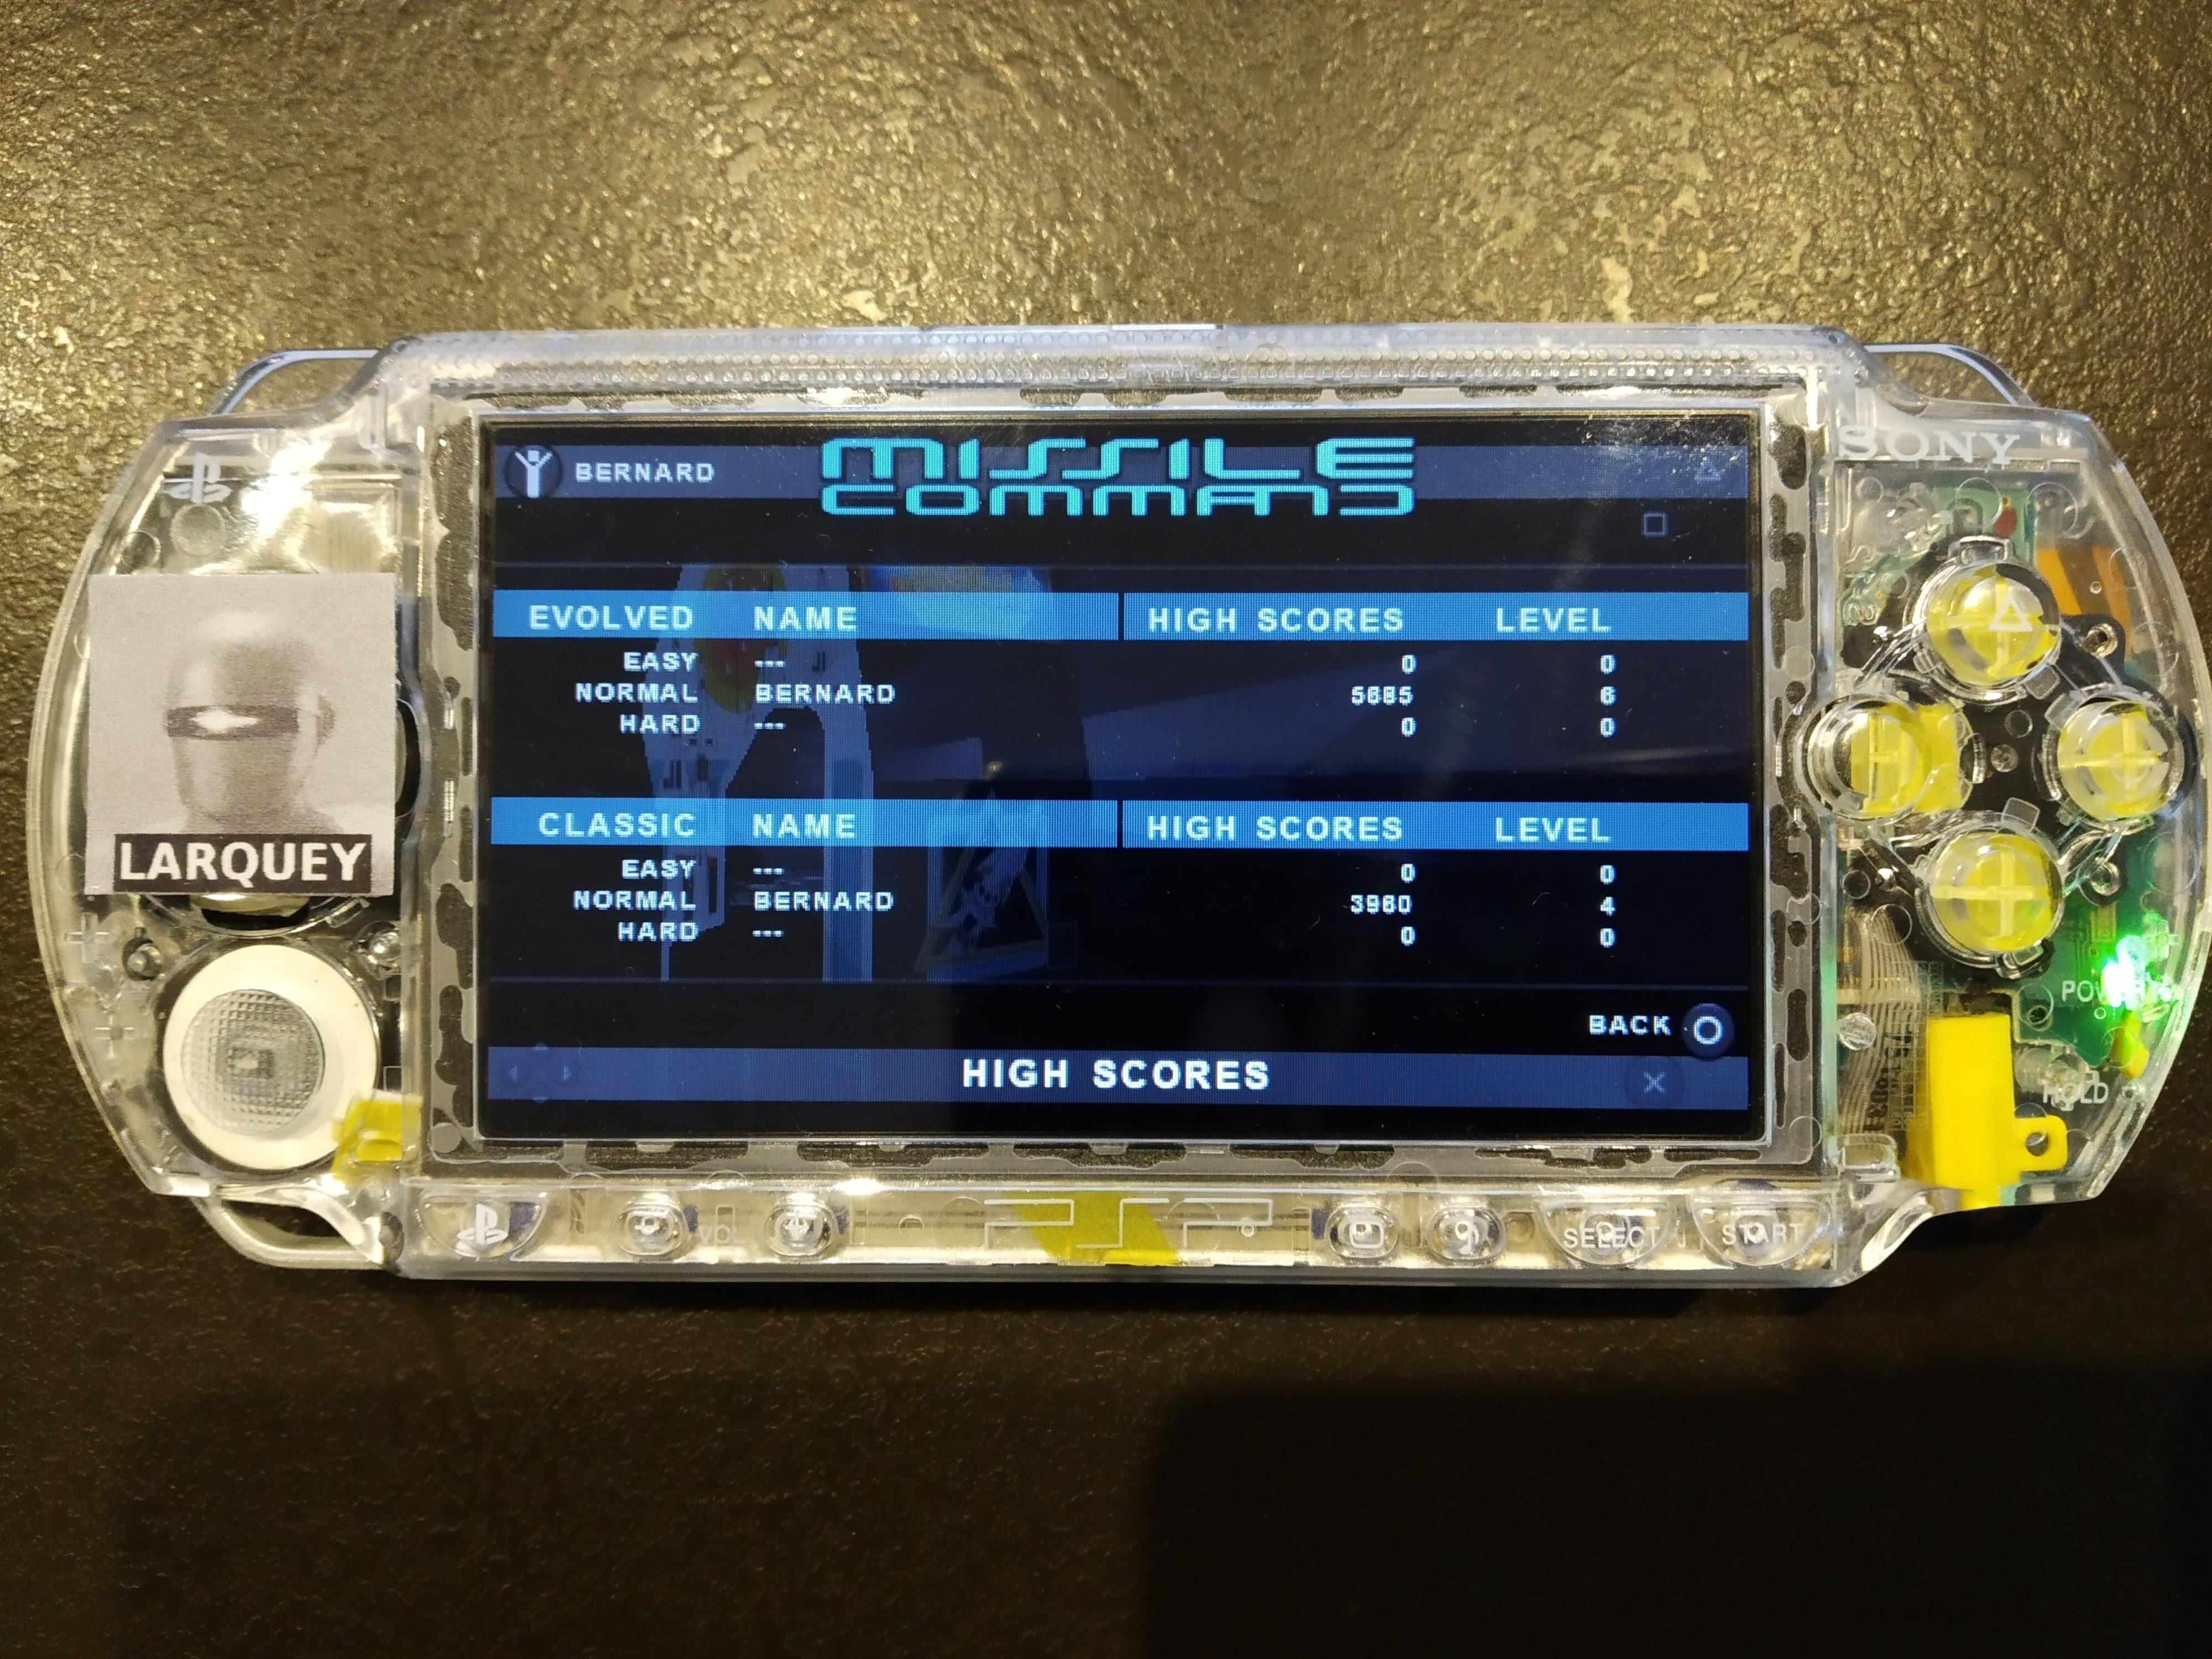 Larquey: Atari Classics Evolved: Missile Command [Evolved] (PSP) 5,885 points on 2019-12-26 17:47:35